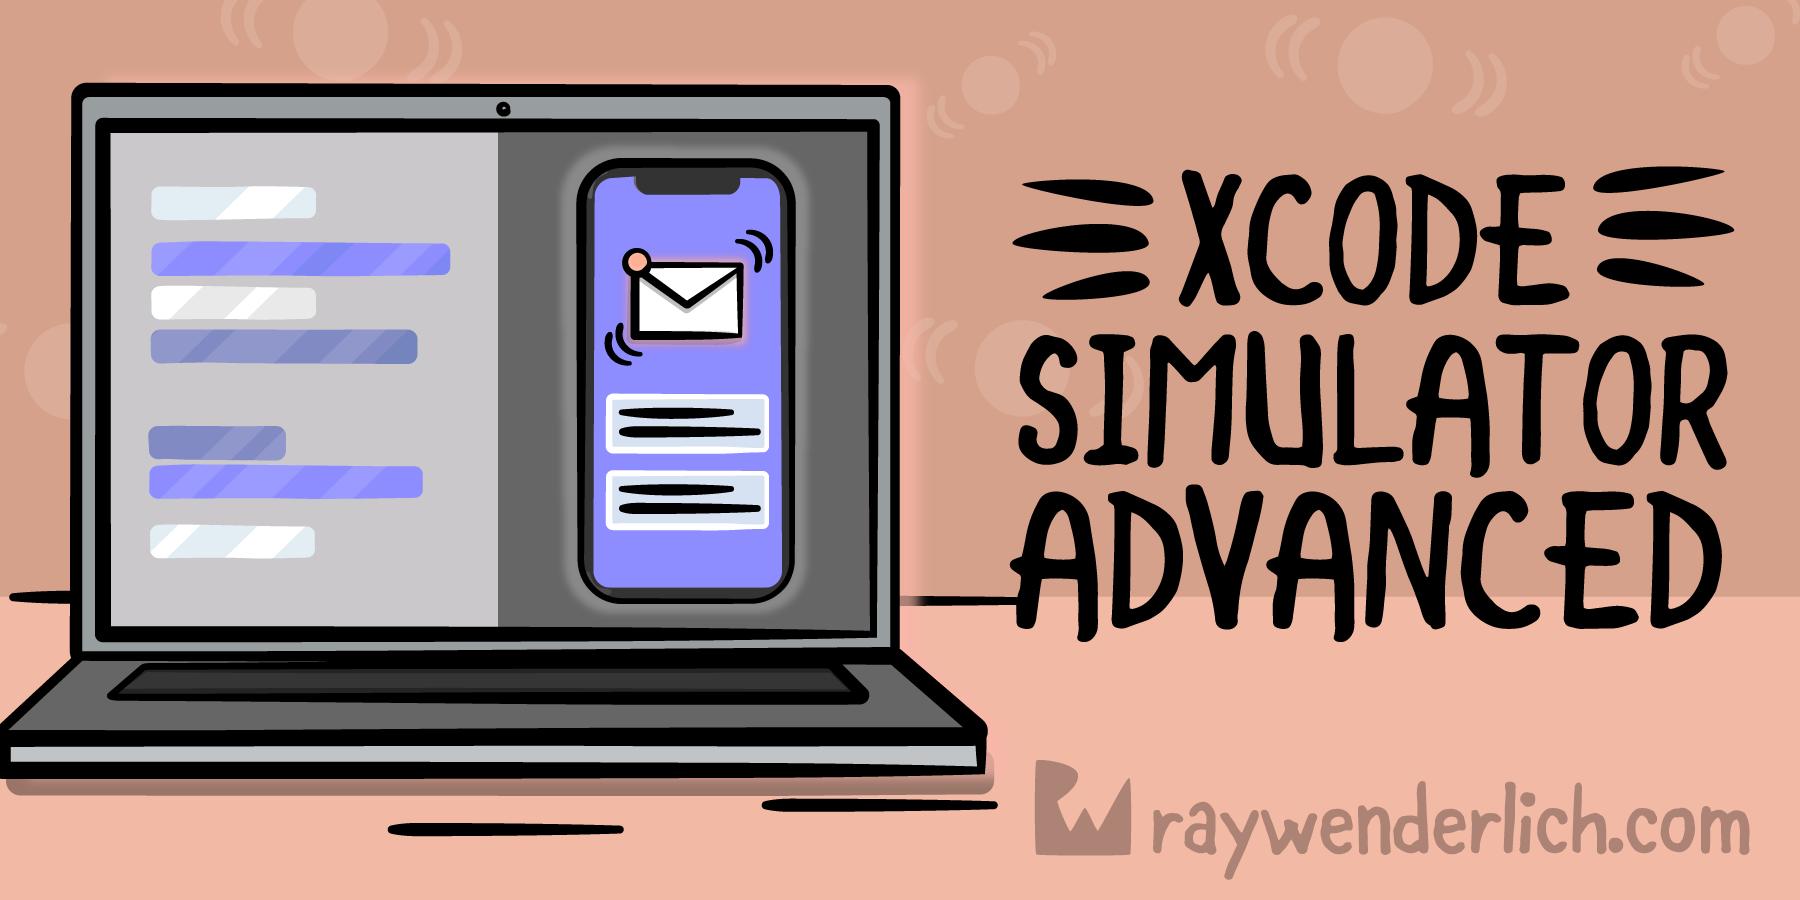 Xcode Simulator App Advanced [FREE]